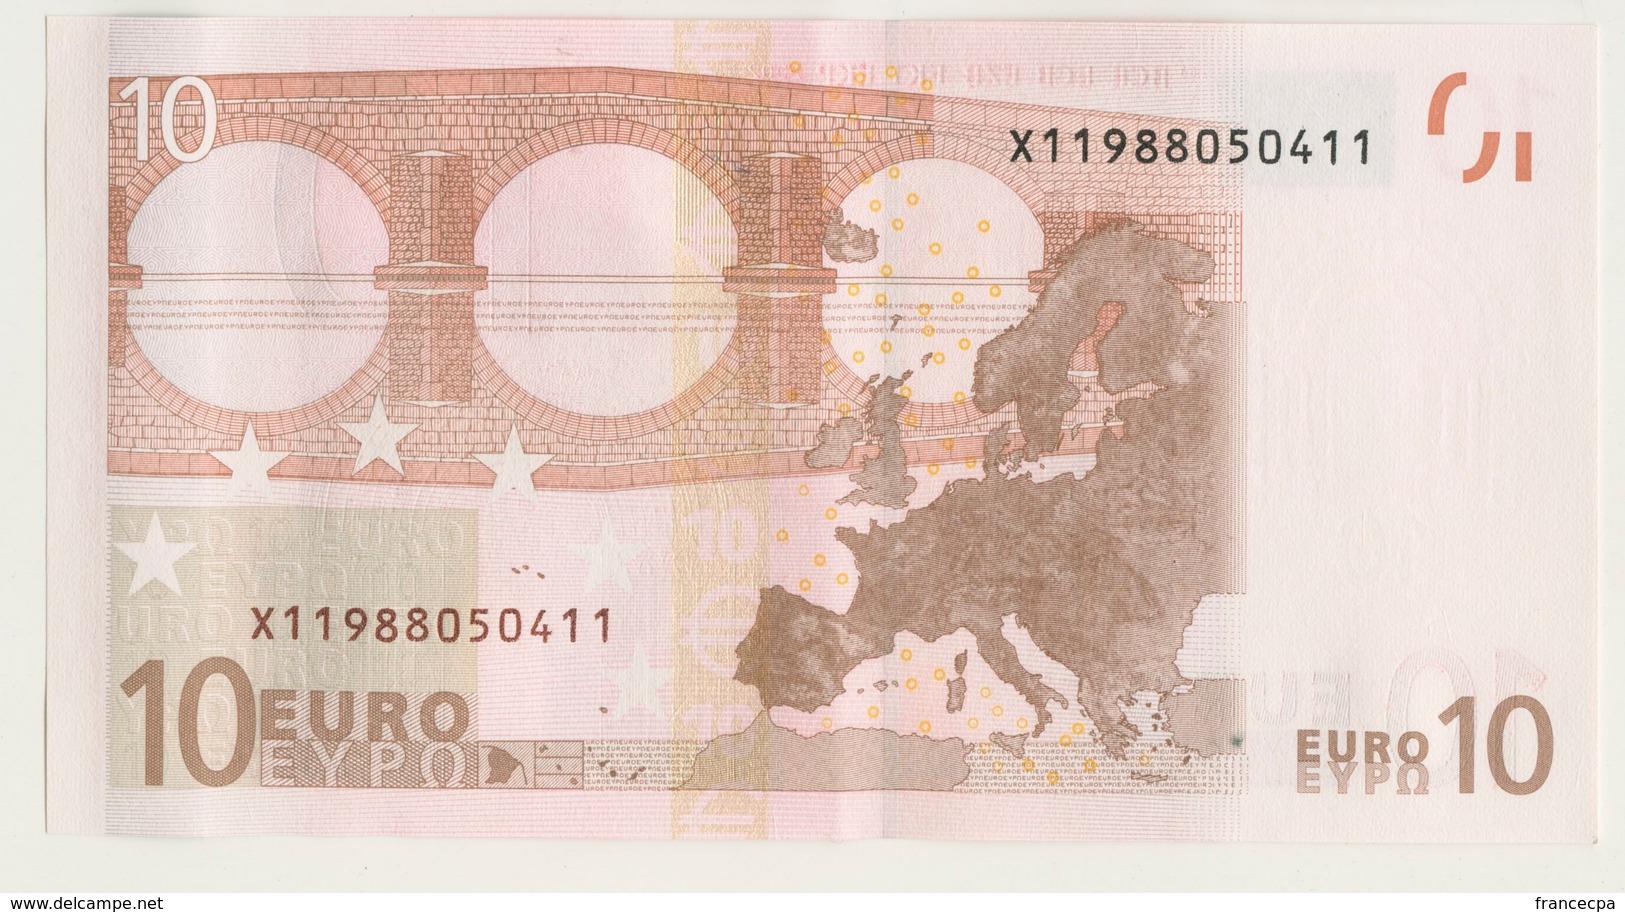 04 - BILLET 10 EURO 2002 NEUF Signature Wim Duisenberg N°  X11988050411 - Imp R012D4 - EURO